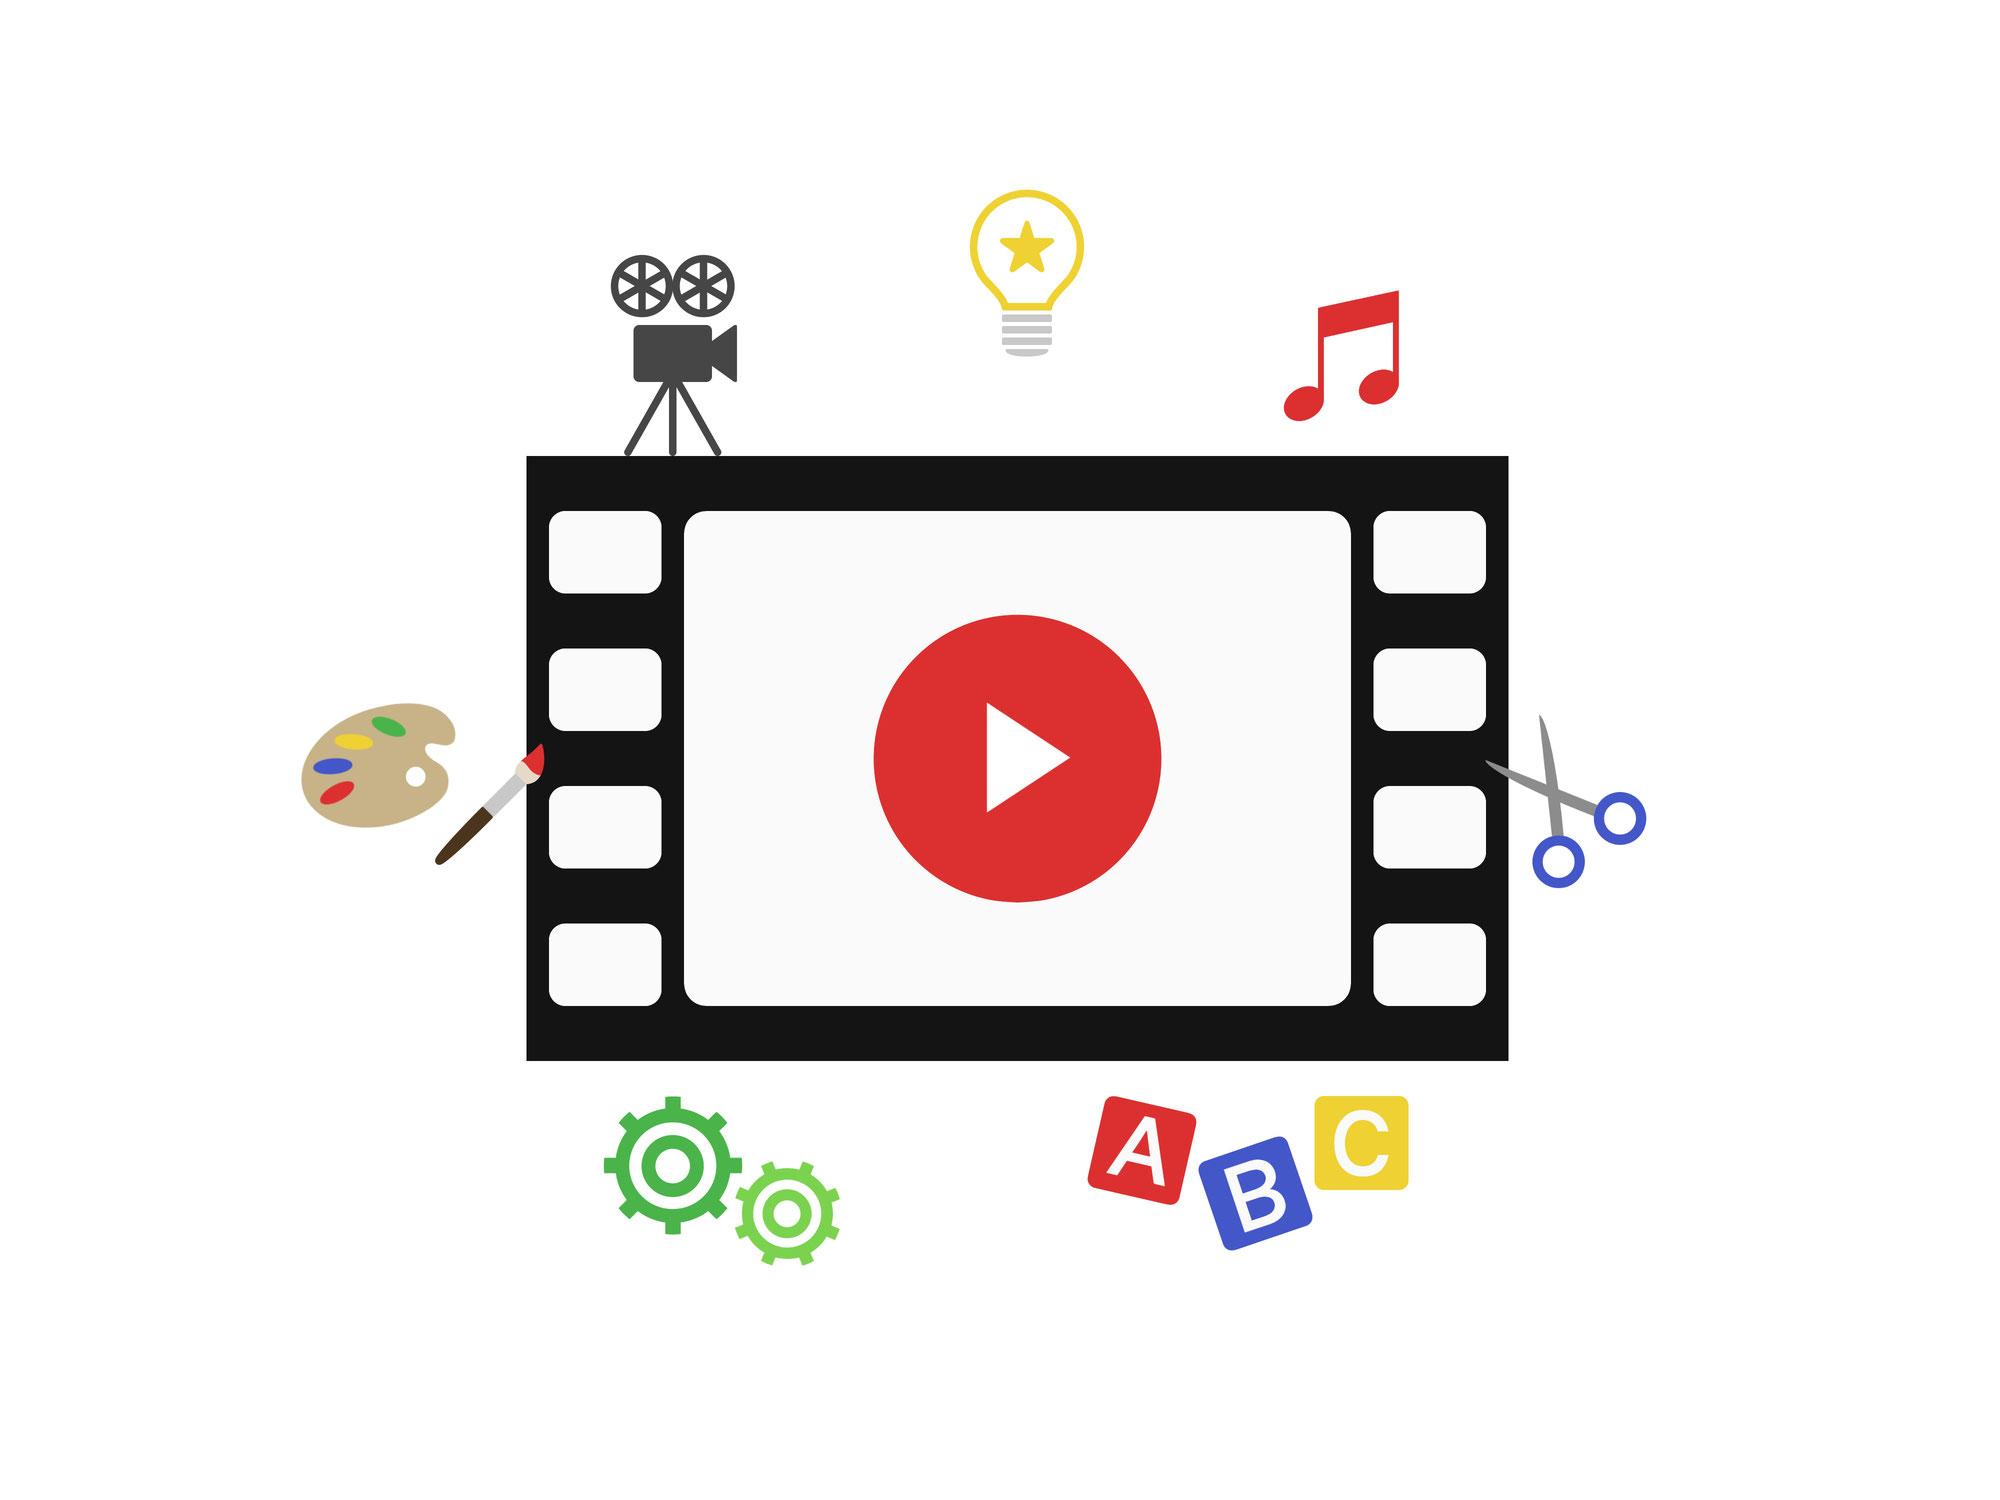 『YouTubeの便利な使い方・動画アップロード』